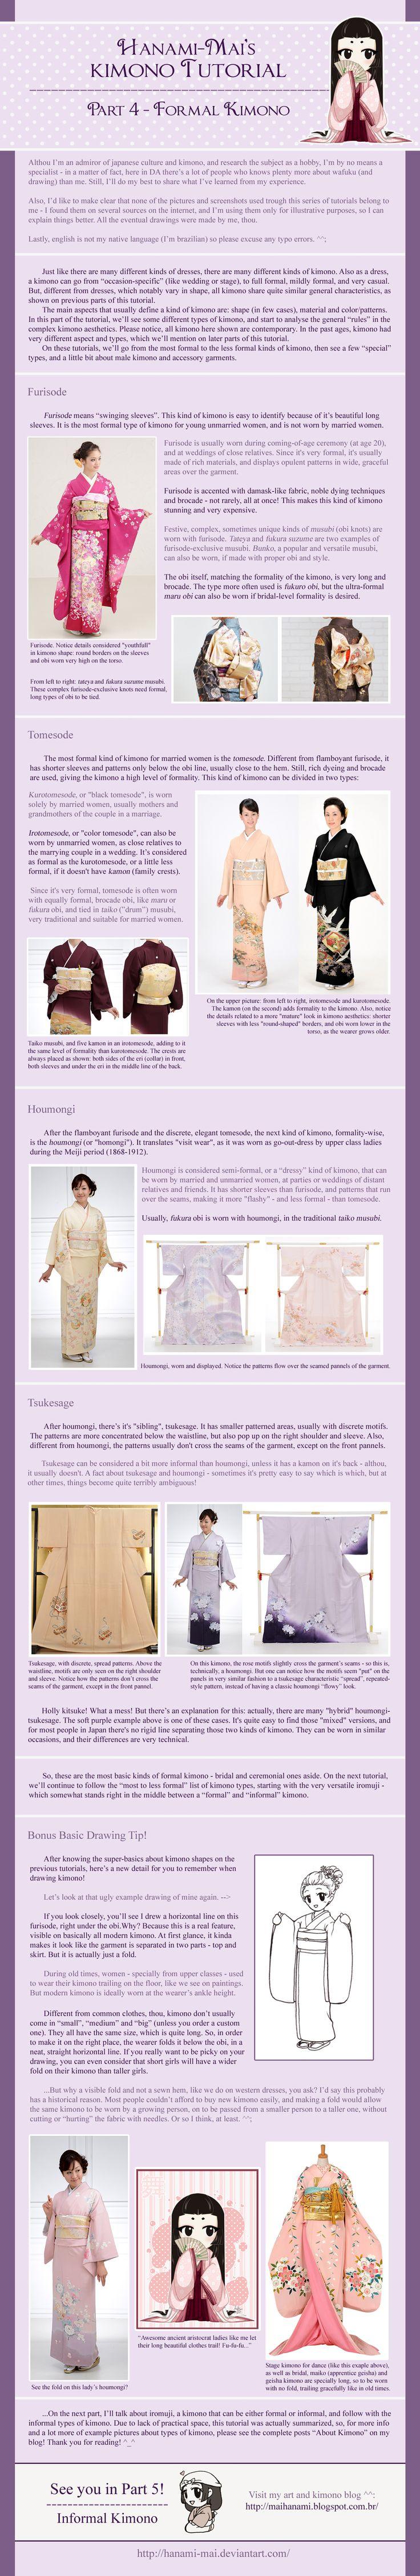 Kimono Tutorial - Part 04 by Hanami-Mai.deviantart.com on @deviantART